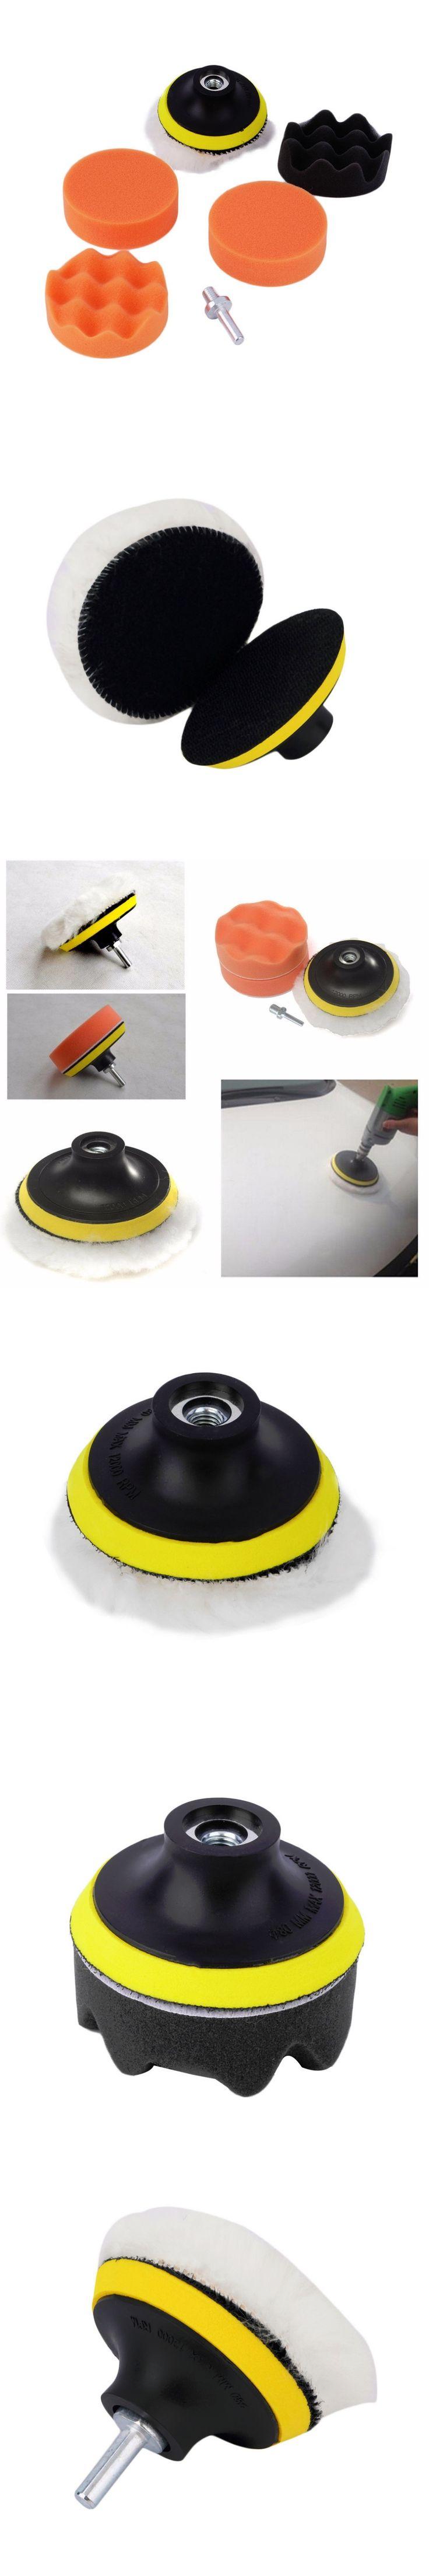 Hot Worldwide 7pcs/set 3 inch Buffing Pad Auto Car Polishing sponge Wheel Kit With M10 Drill Adapter Buffer Dropping Shipping~